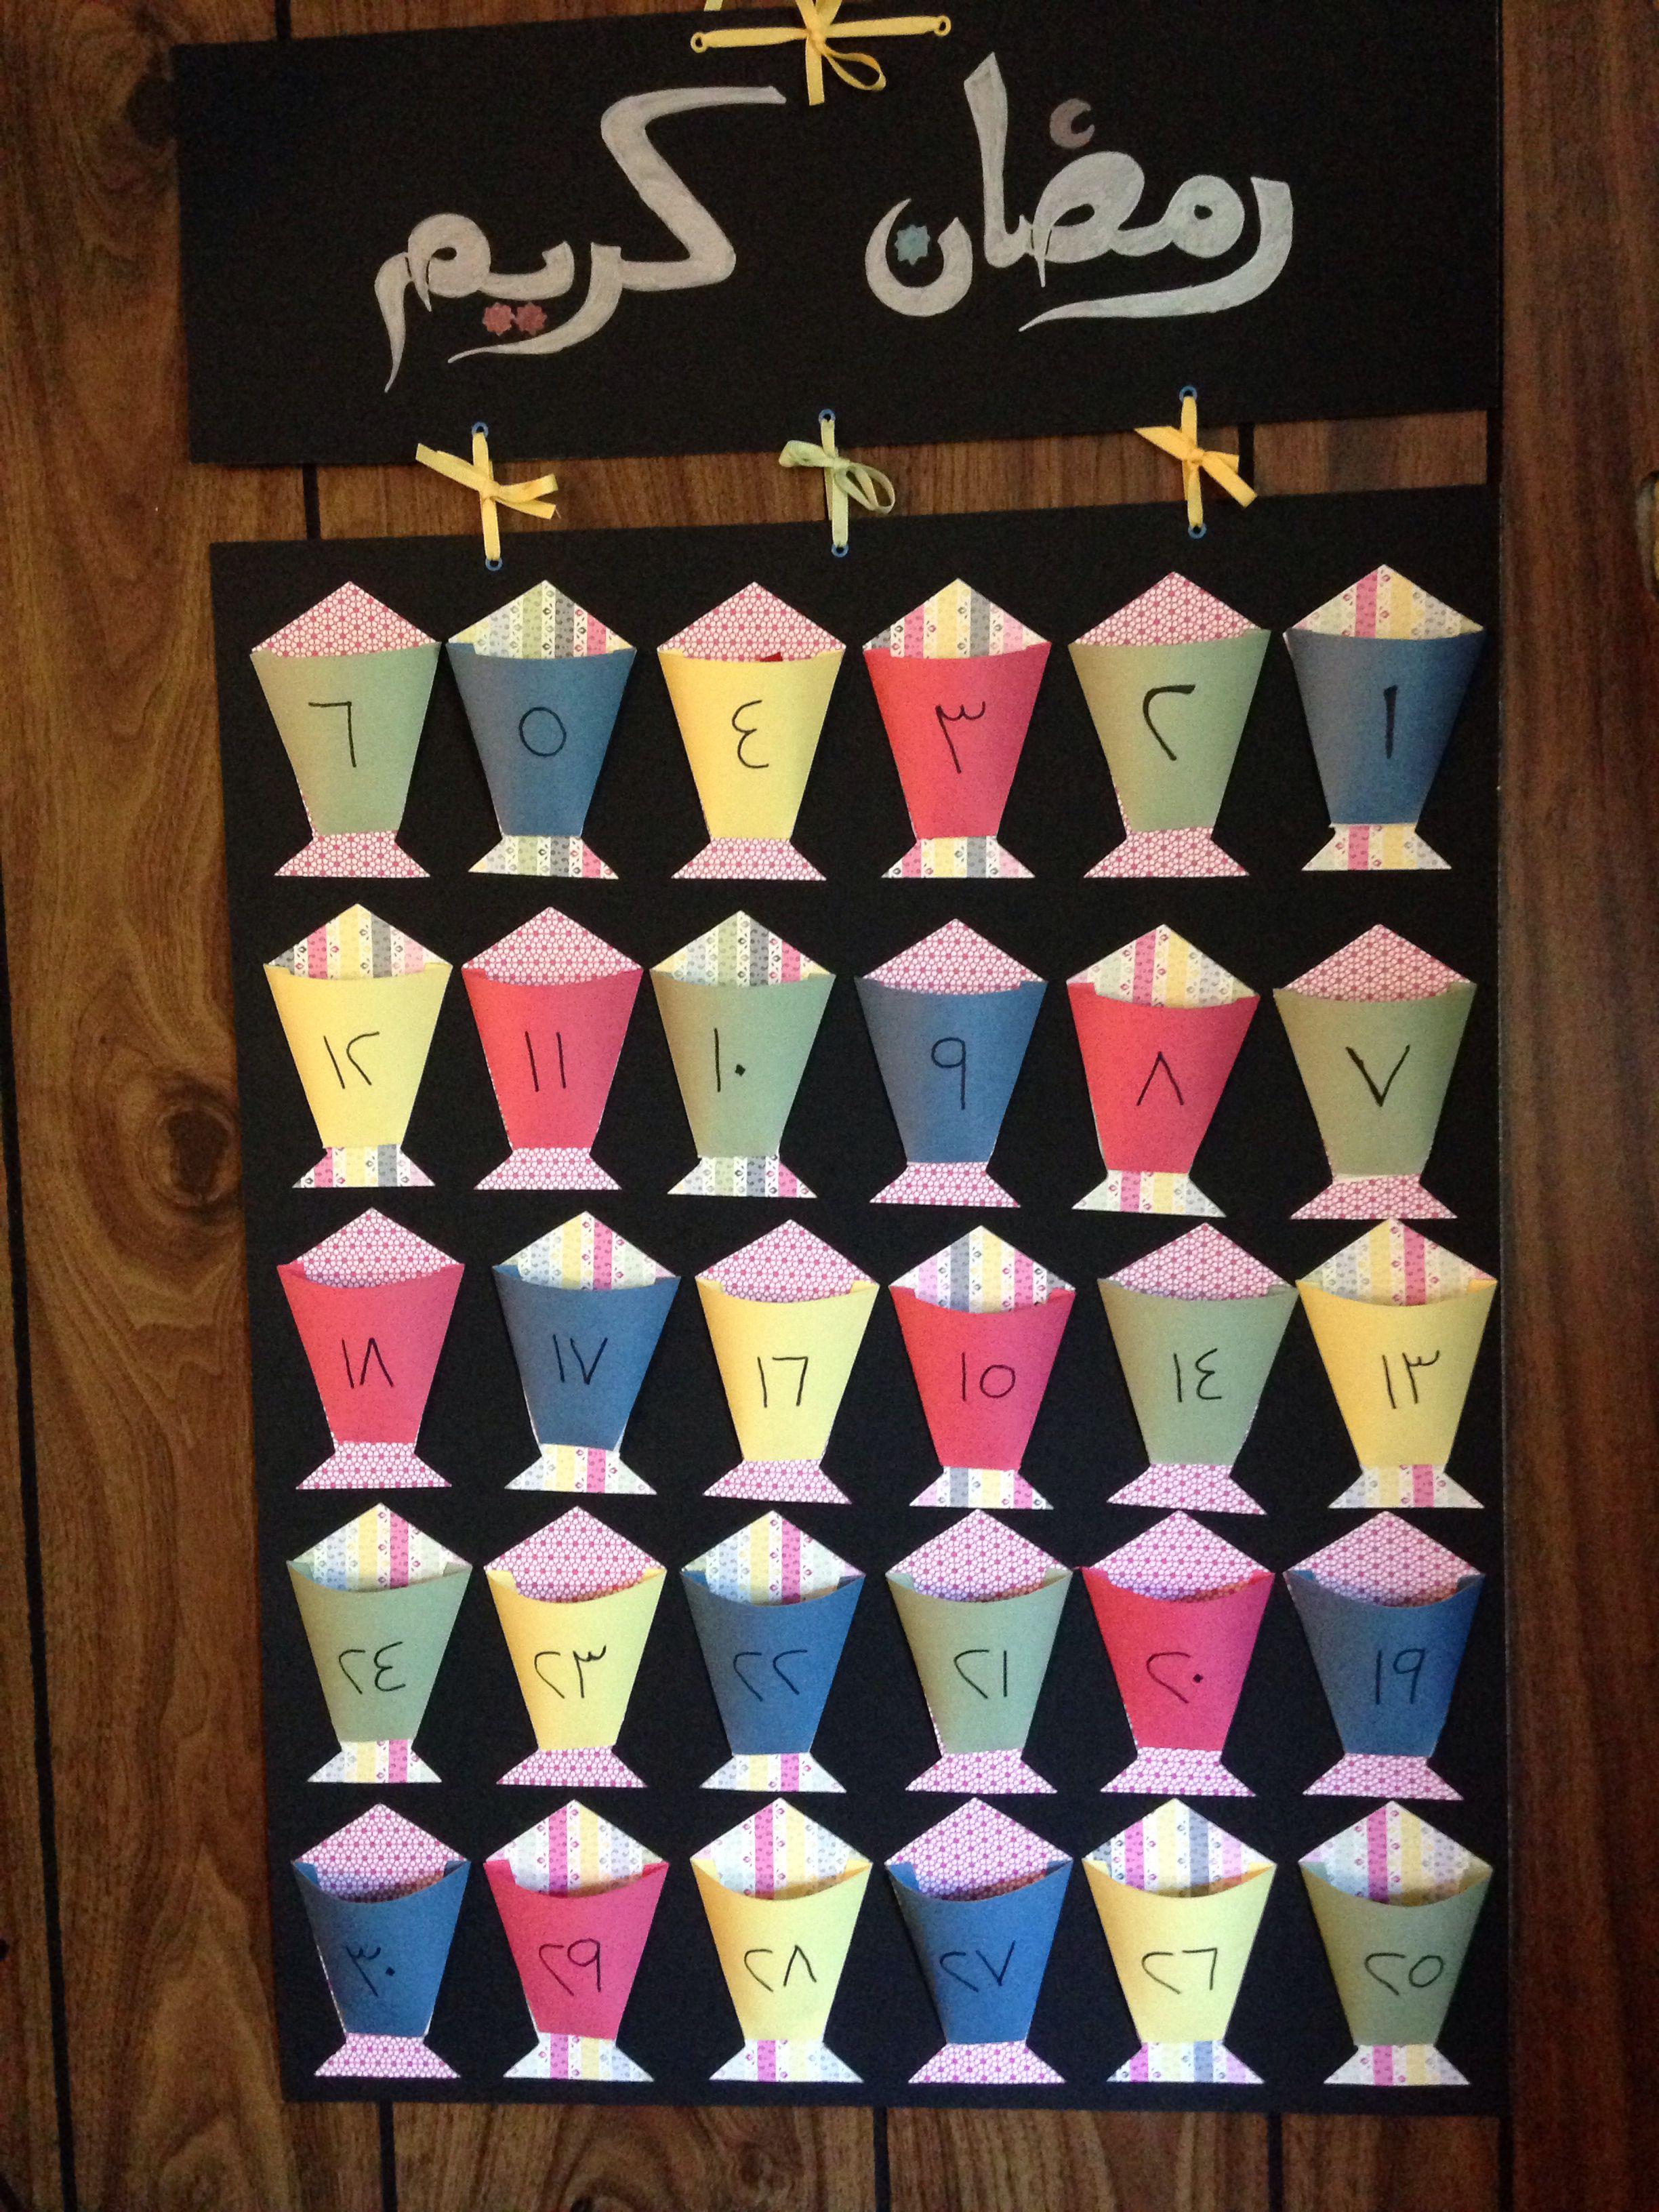 17 Simple Ramadan Decoration Ideas You Can Do At Home Ramadan Kids Ramadan Activities Ramadan Crafts